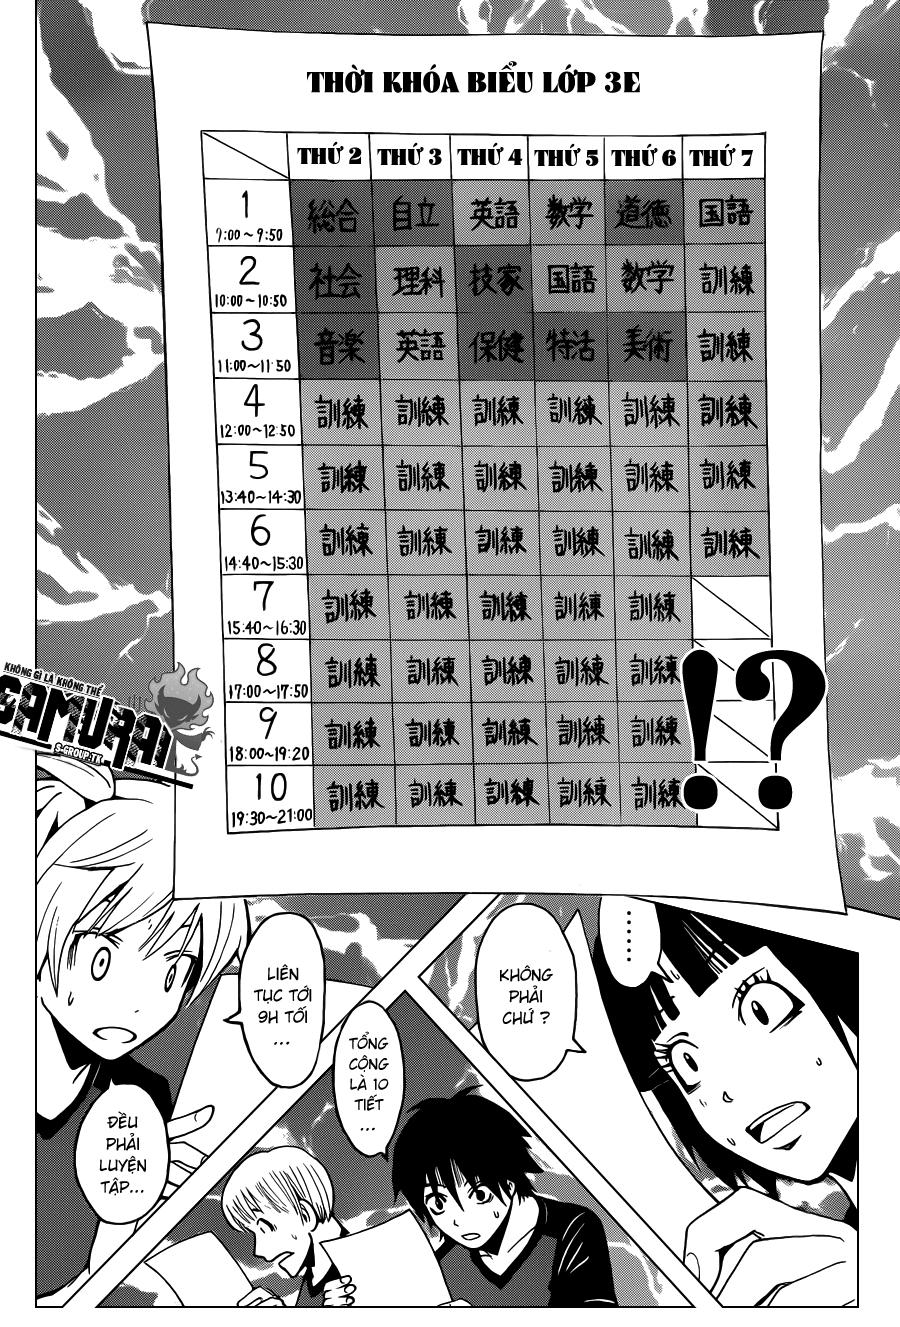 Ansatsu Kyoushitsu chap 39 trang 11